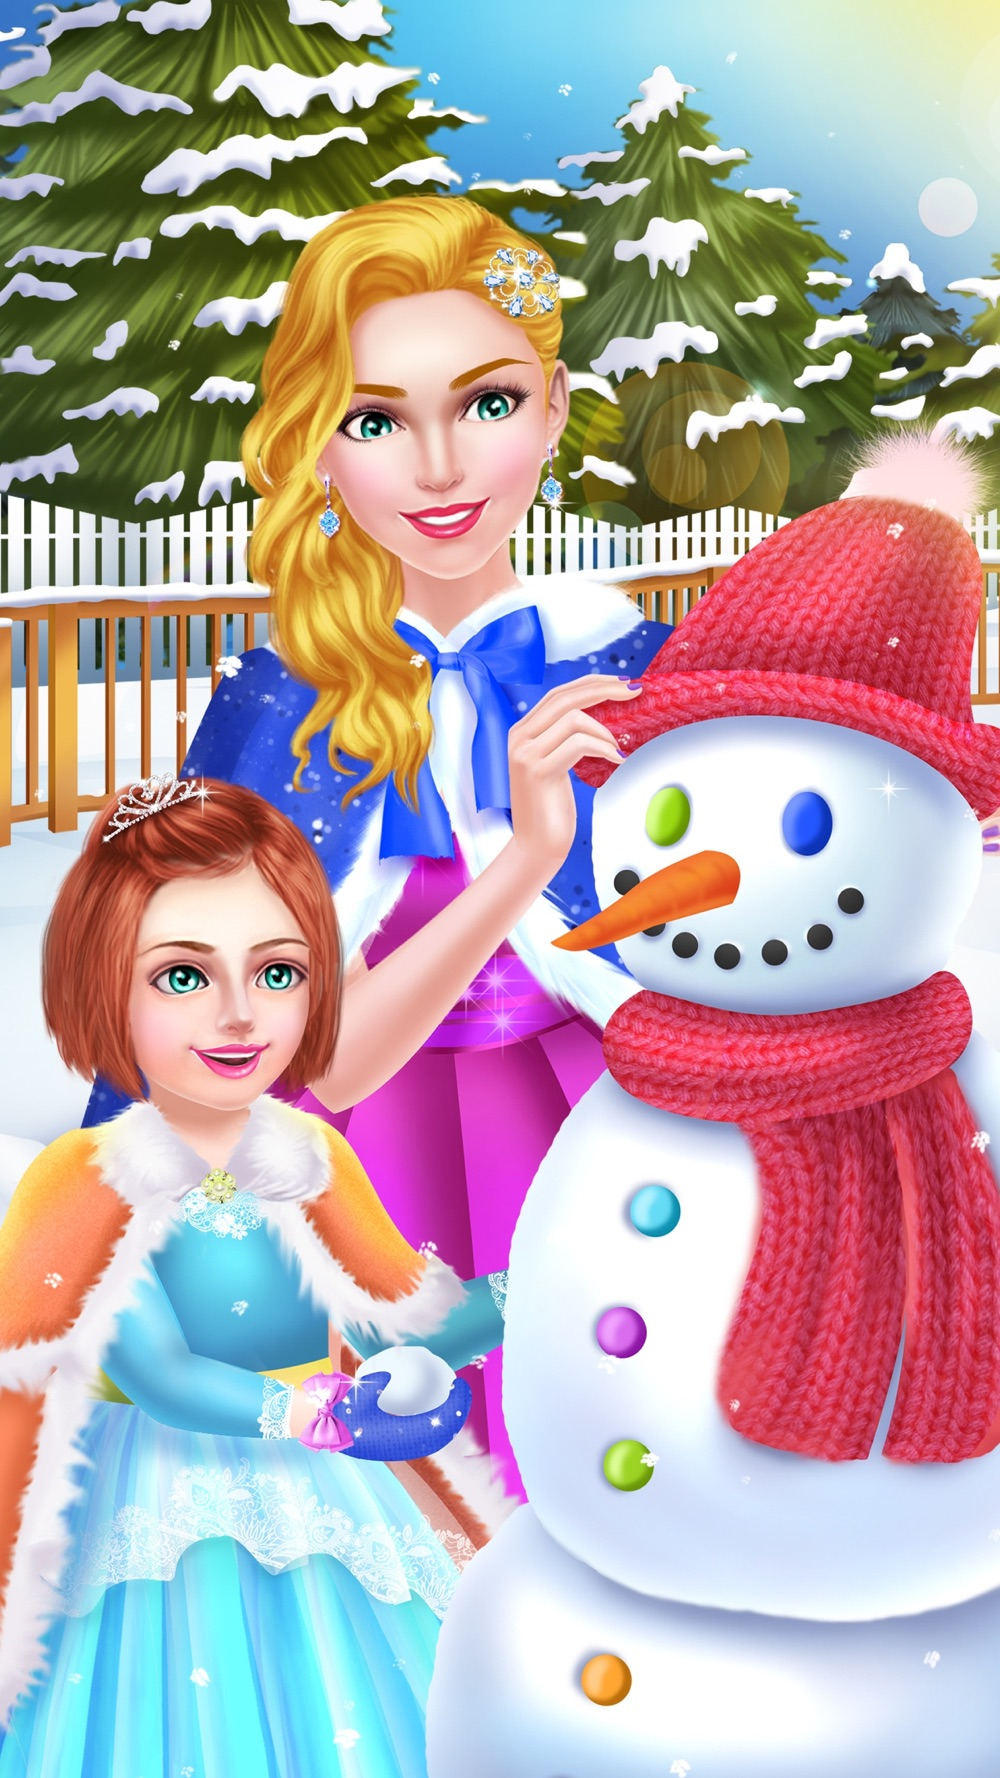 Royal Family Winter Salon - Snow Princess Makeover hack tool